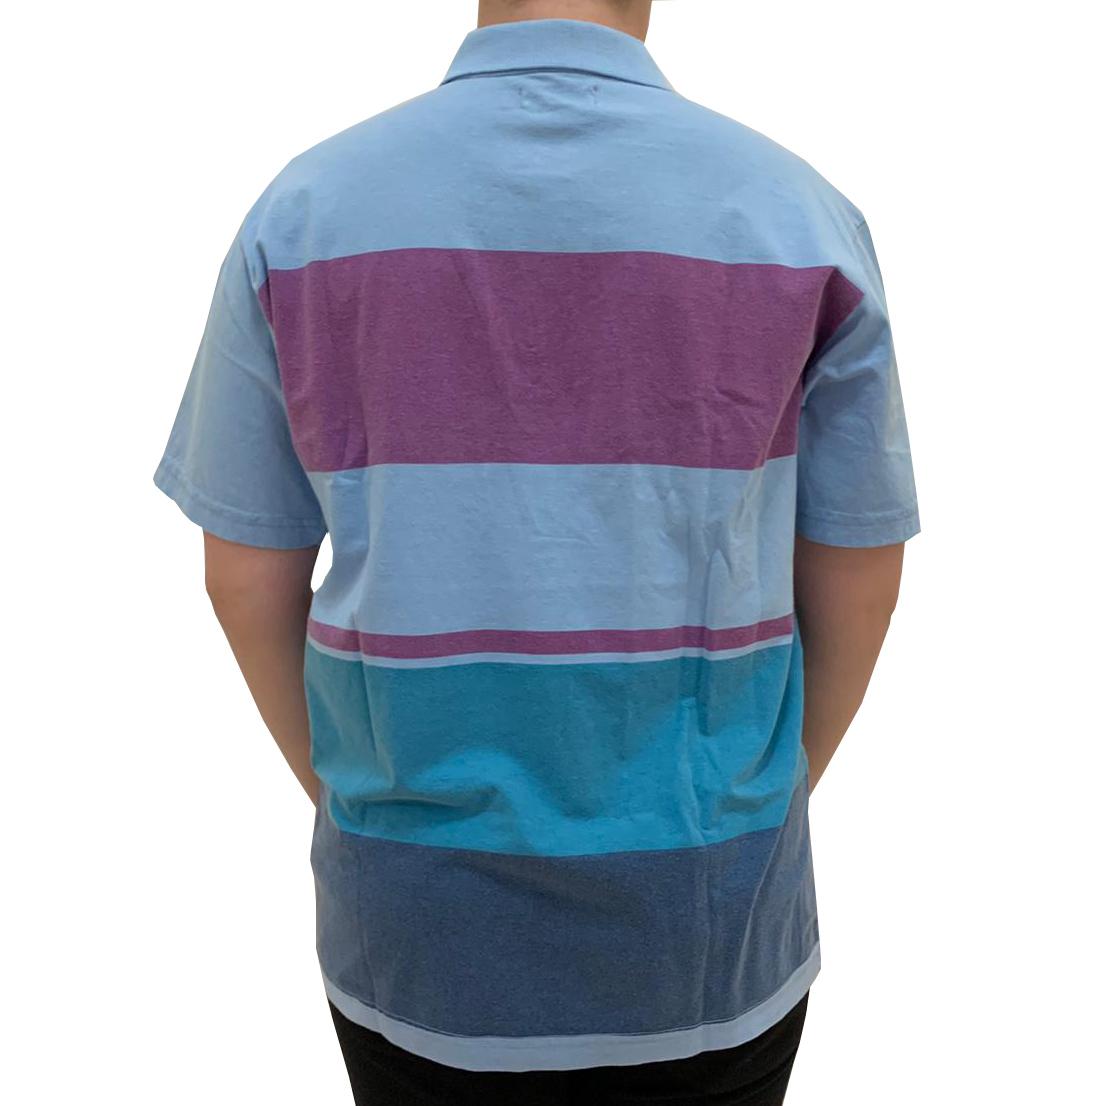 Camisa Polo Proside Malha Listrada PS